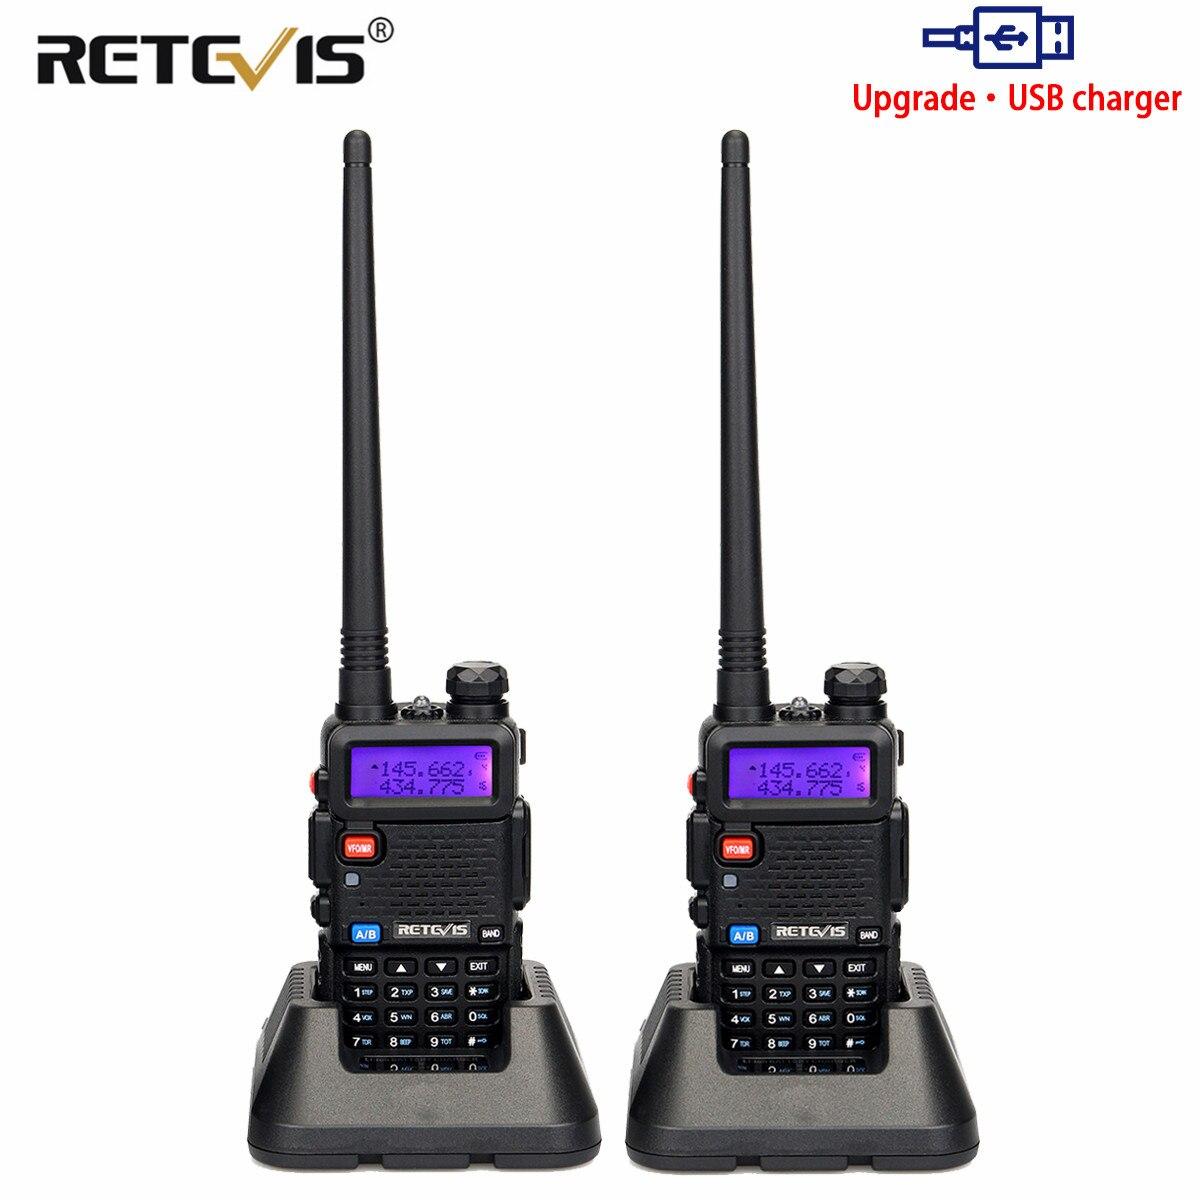 Retevis RT5R اسلكية تخاطب 2 قطعة 5W 128CH USB VHF UHF هام راديو اتجاهين راديو Comunicador للصيد/الادسنس Baofeng UV-5R UV5R